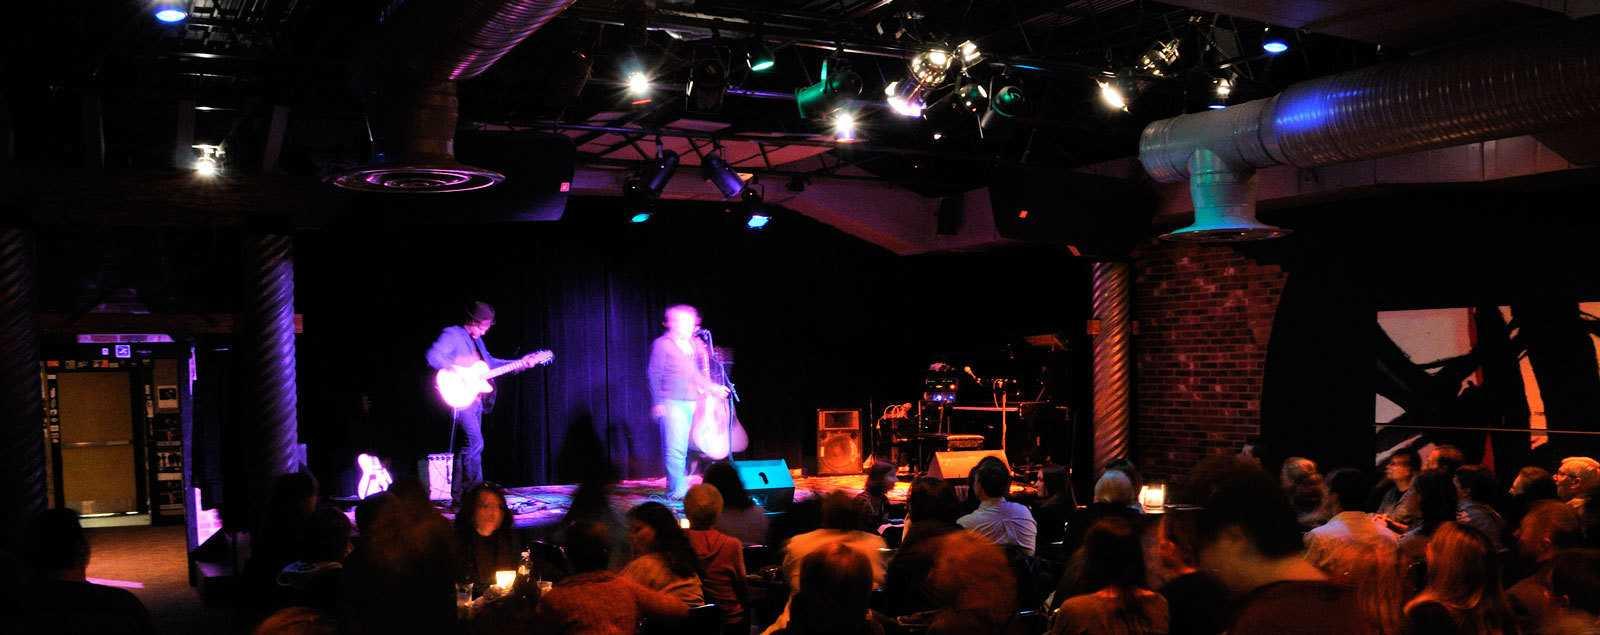 Live Music Venues Bars Fairfax County Virginia